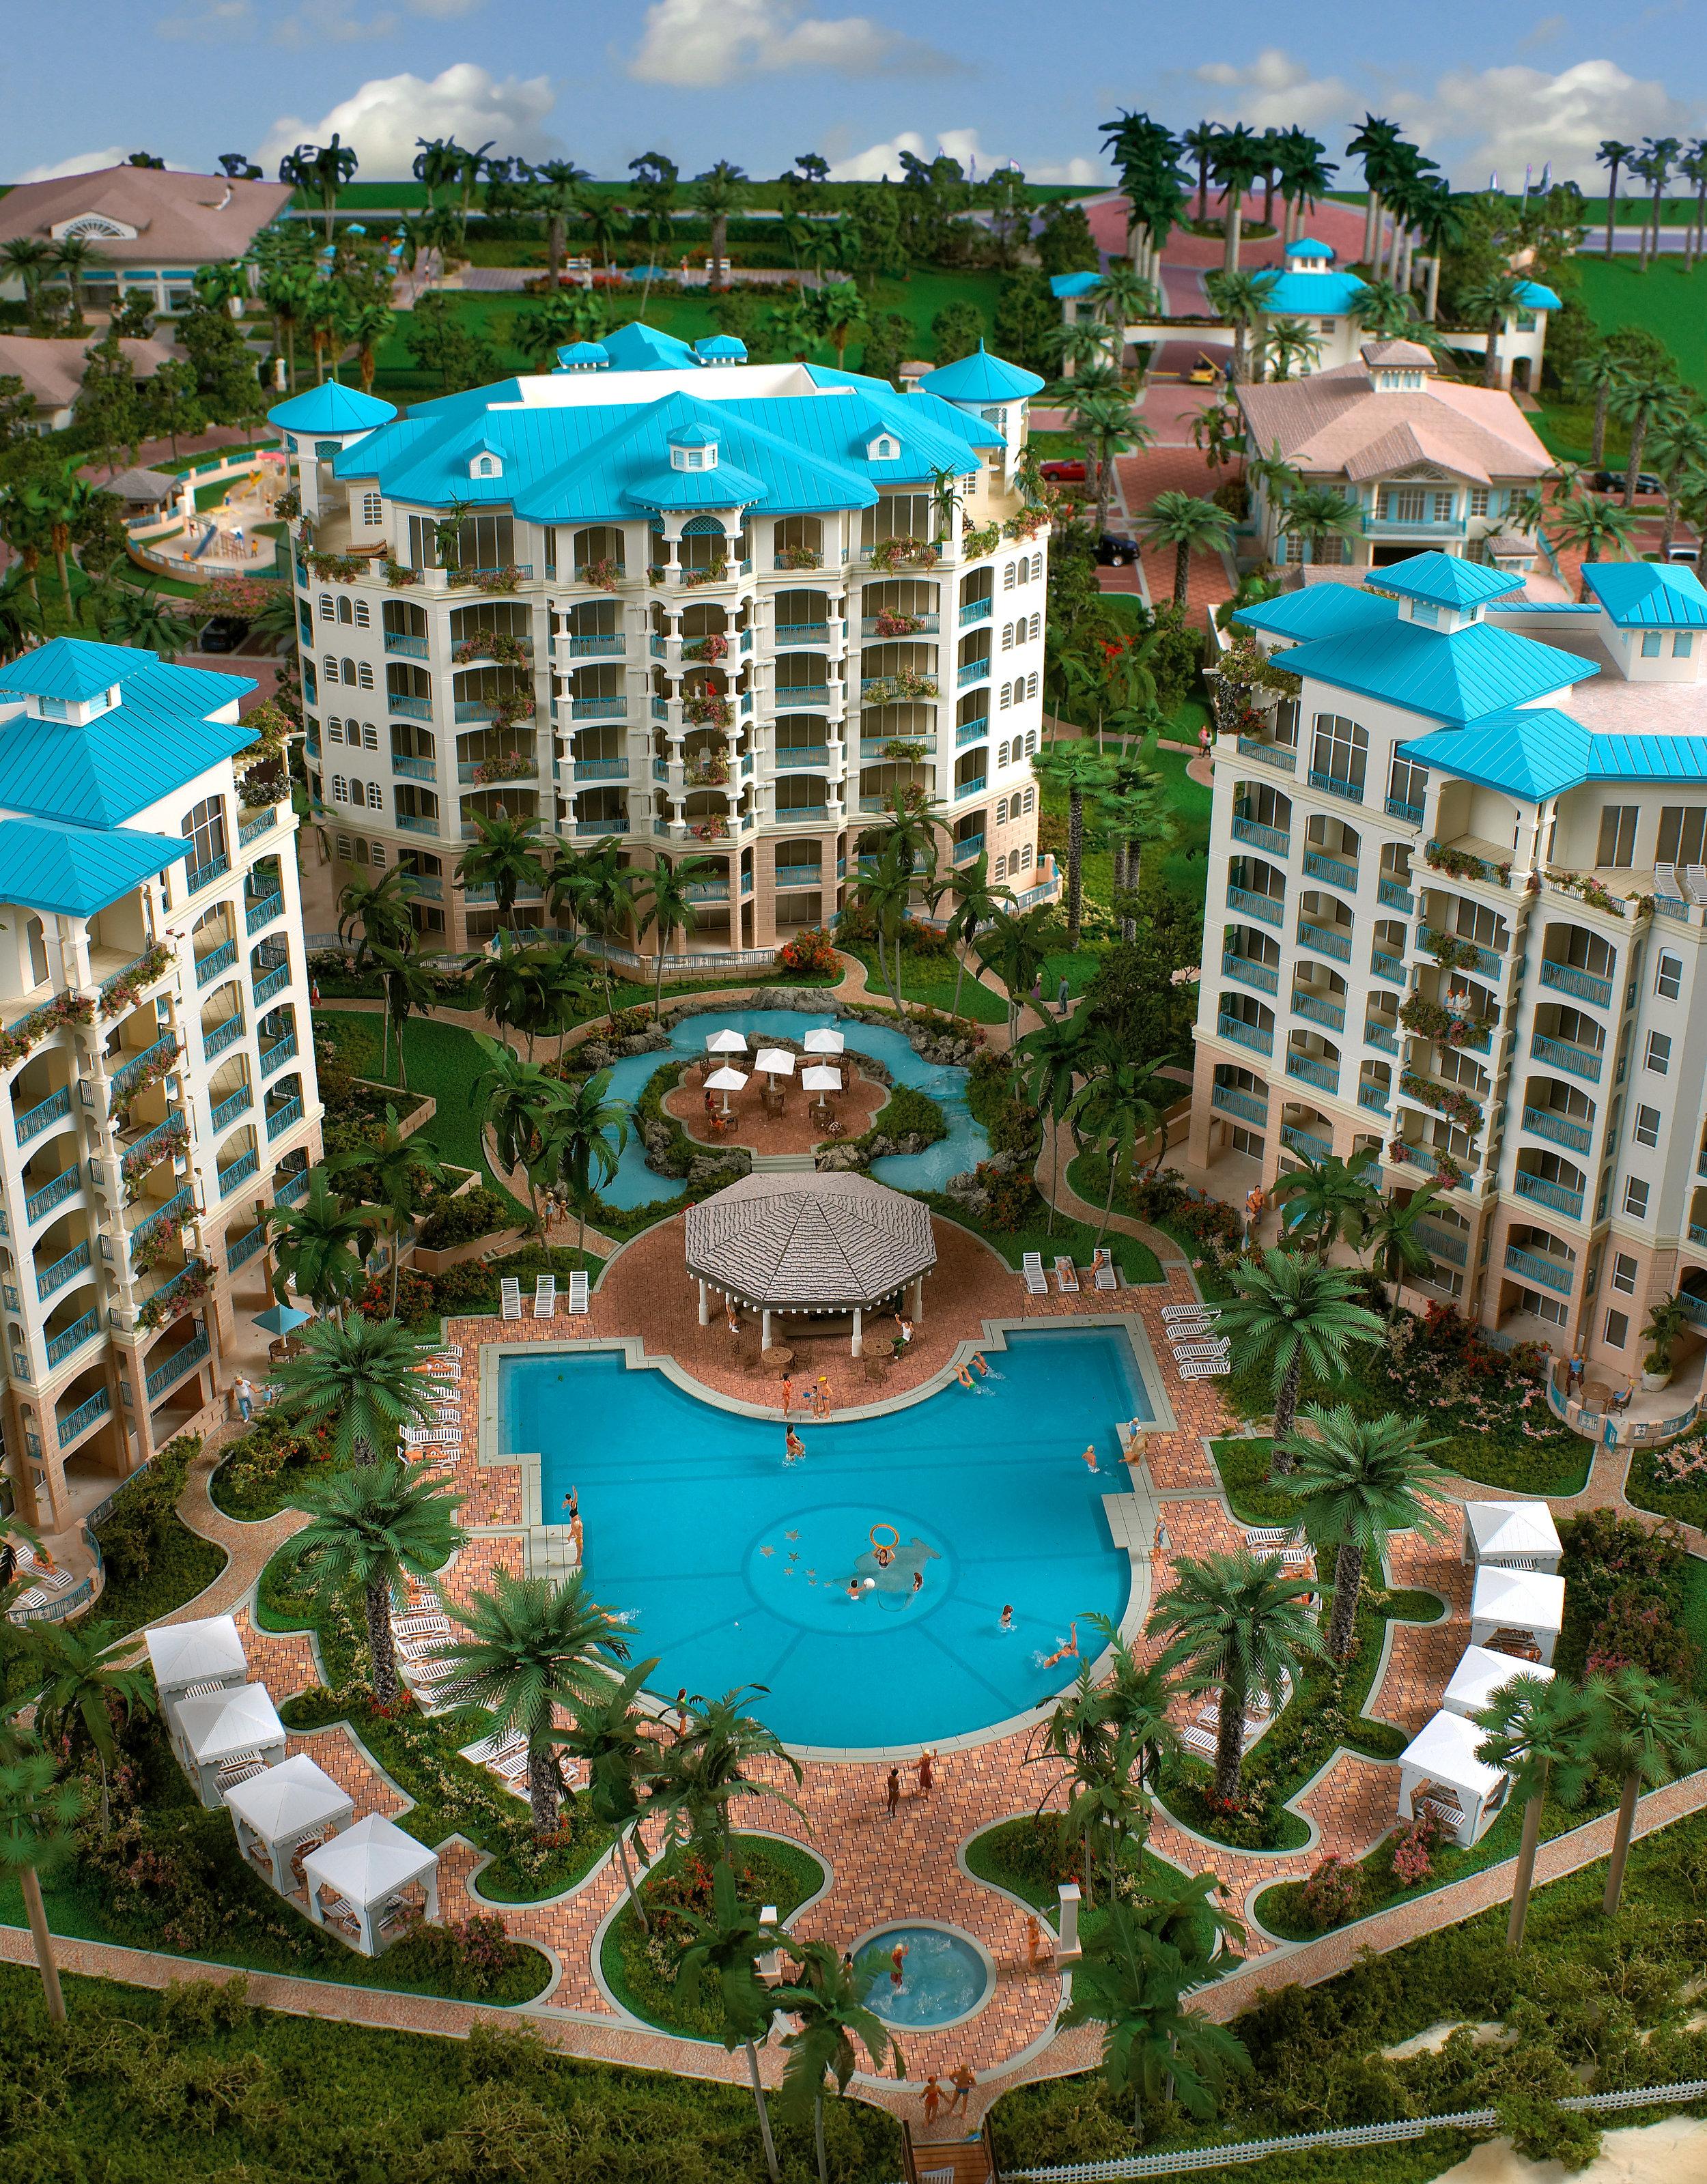 Seven Stars Resort | Turks and Caicos